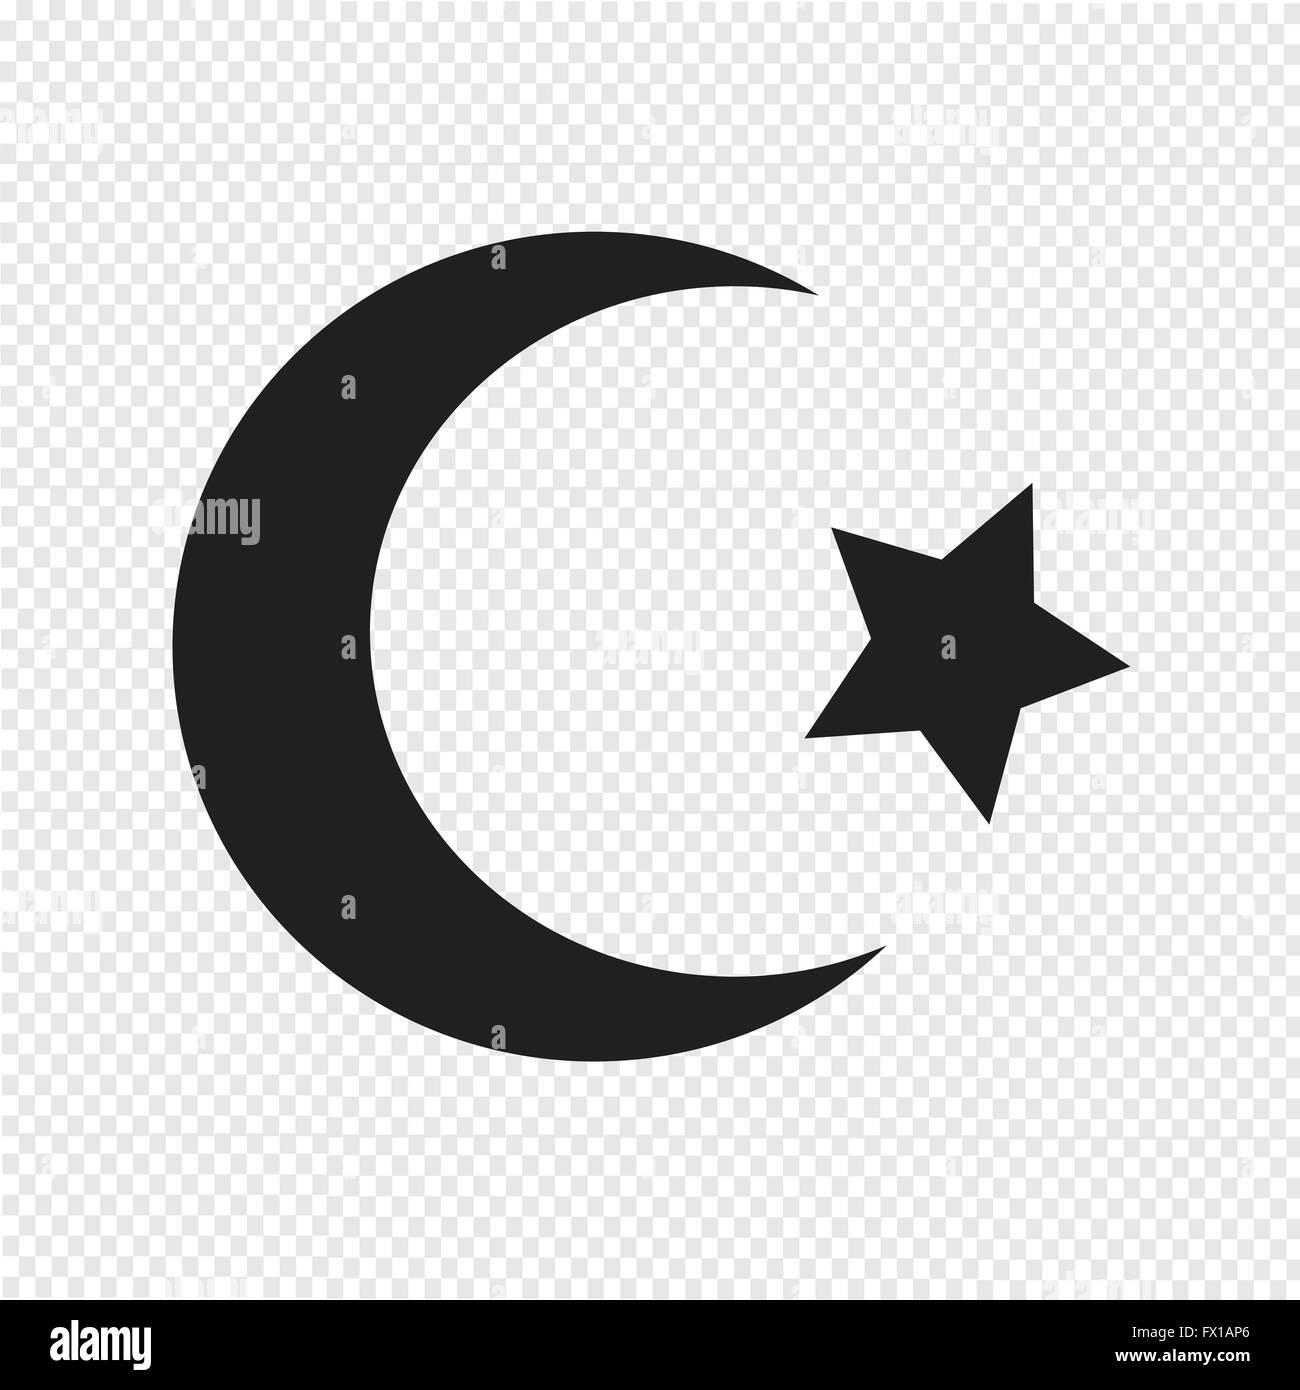 Symbol of islam star crescent icon stock vector art illustration symbol of islam star crescent icon buycottarizona Gallery